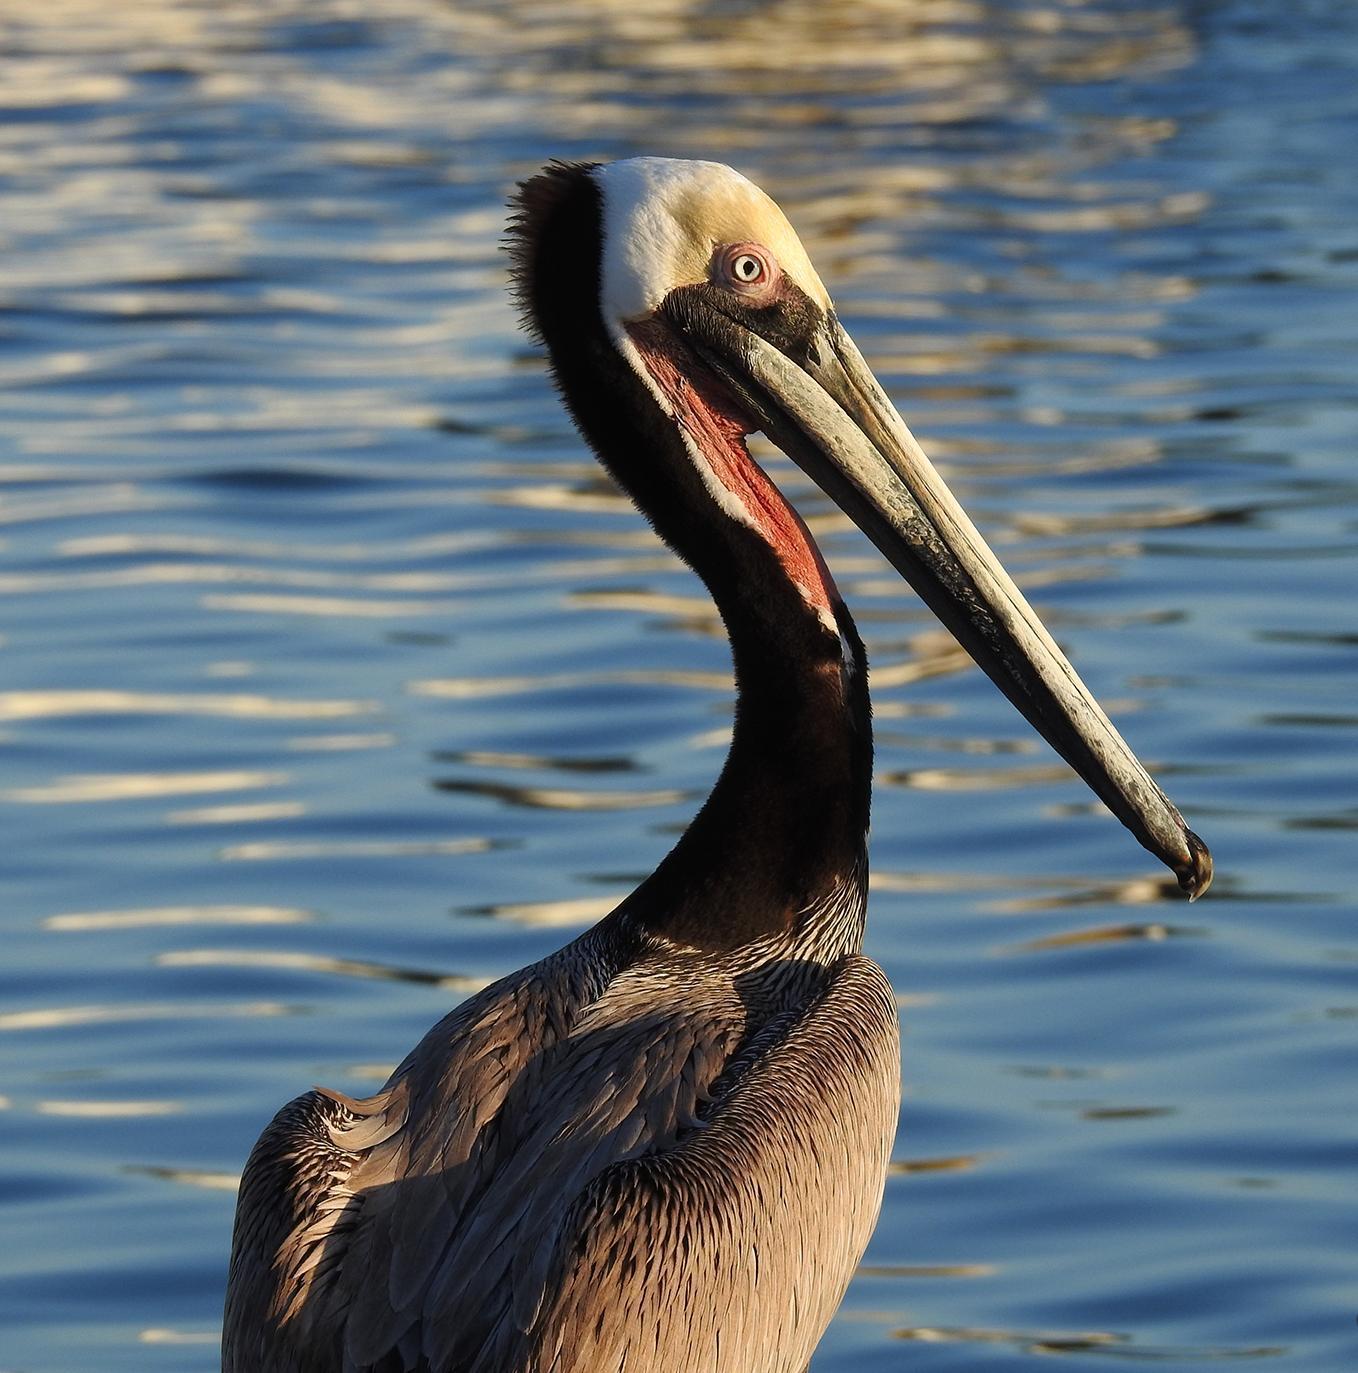 Brown Pelican Photo by Alejandra Perez